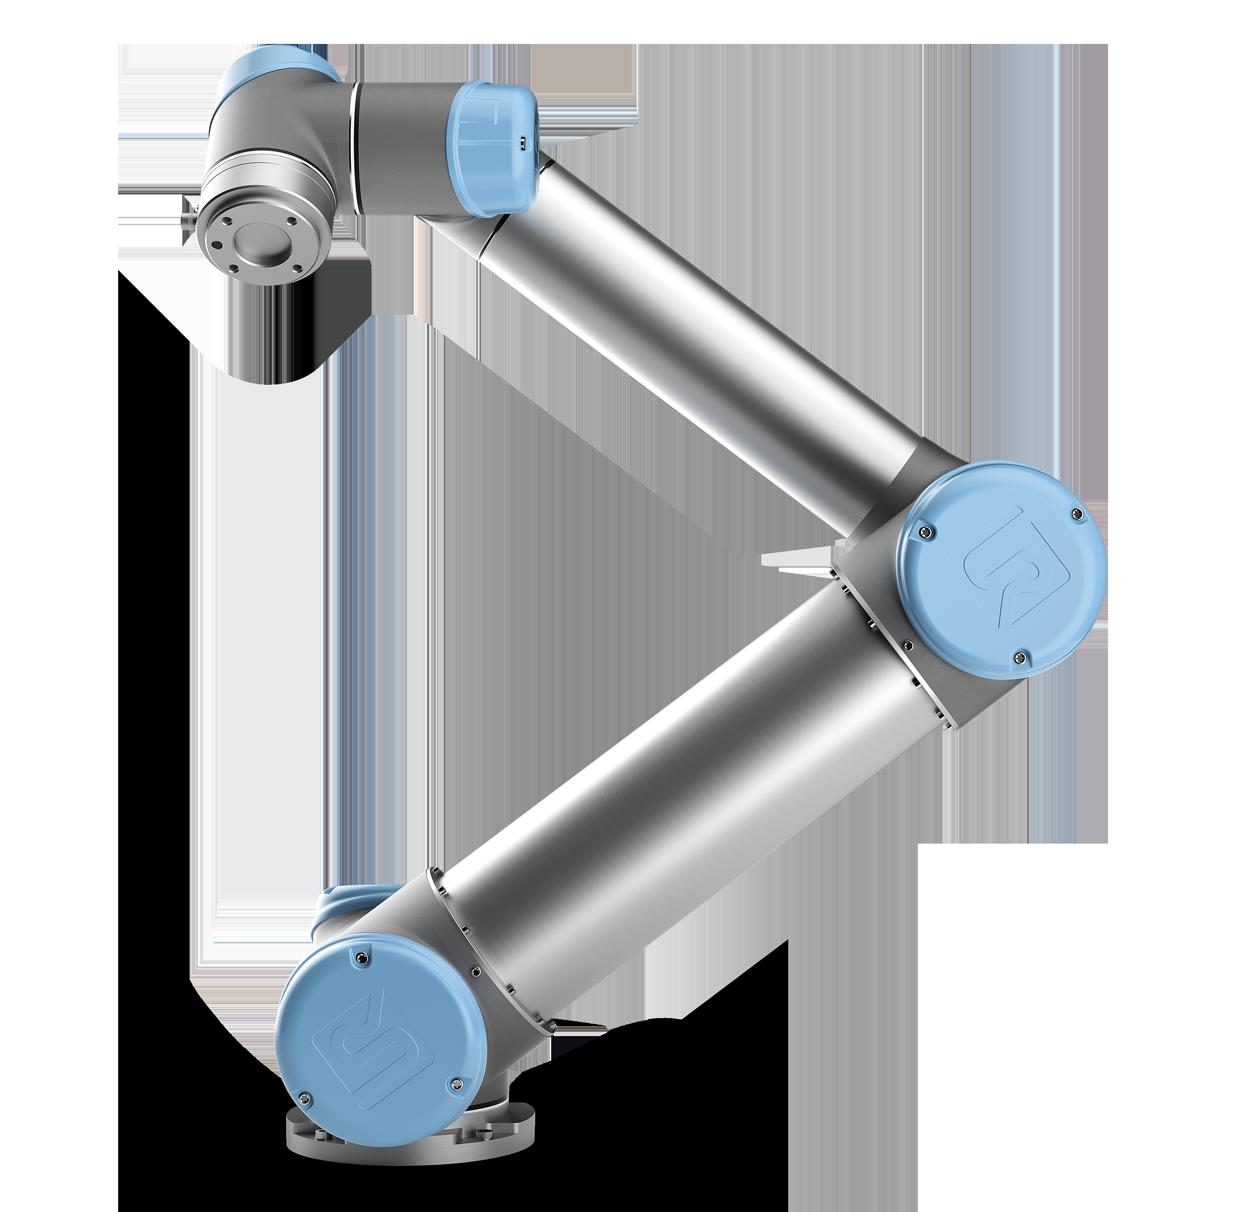 RobotWorx - Universal Robots UR5e